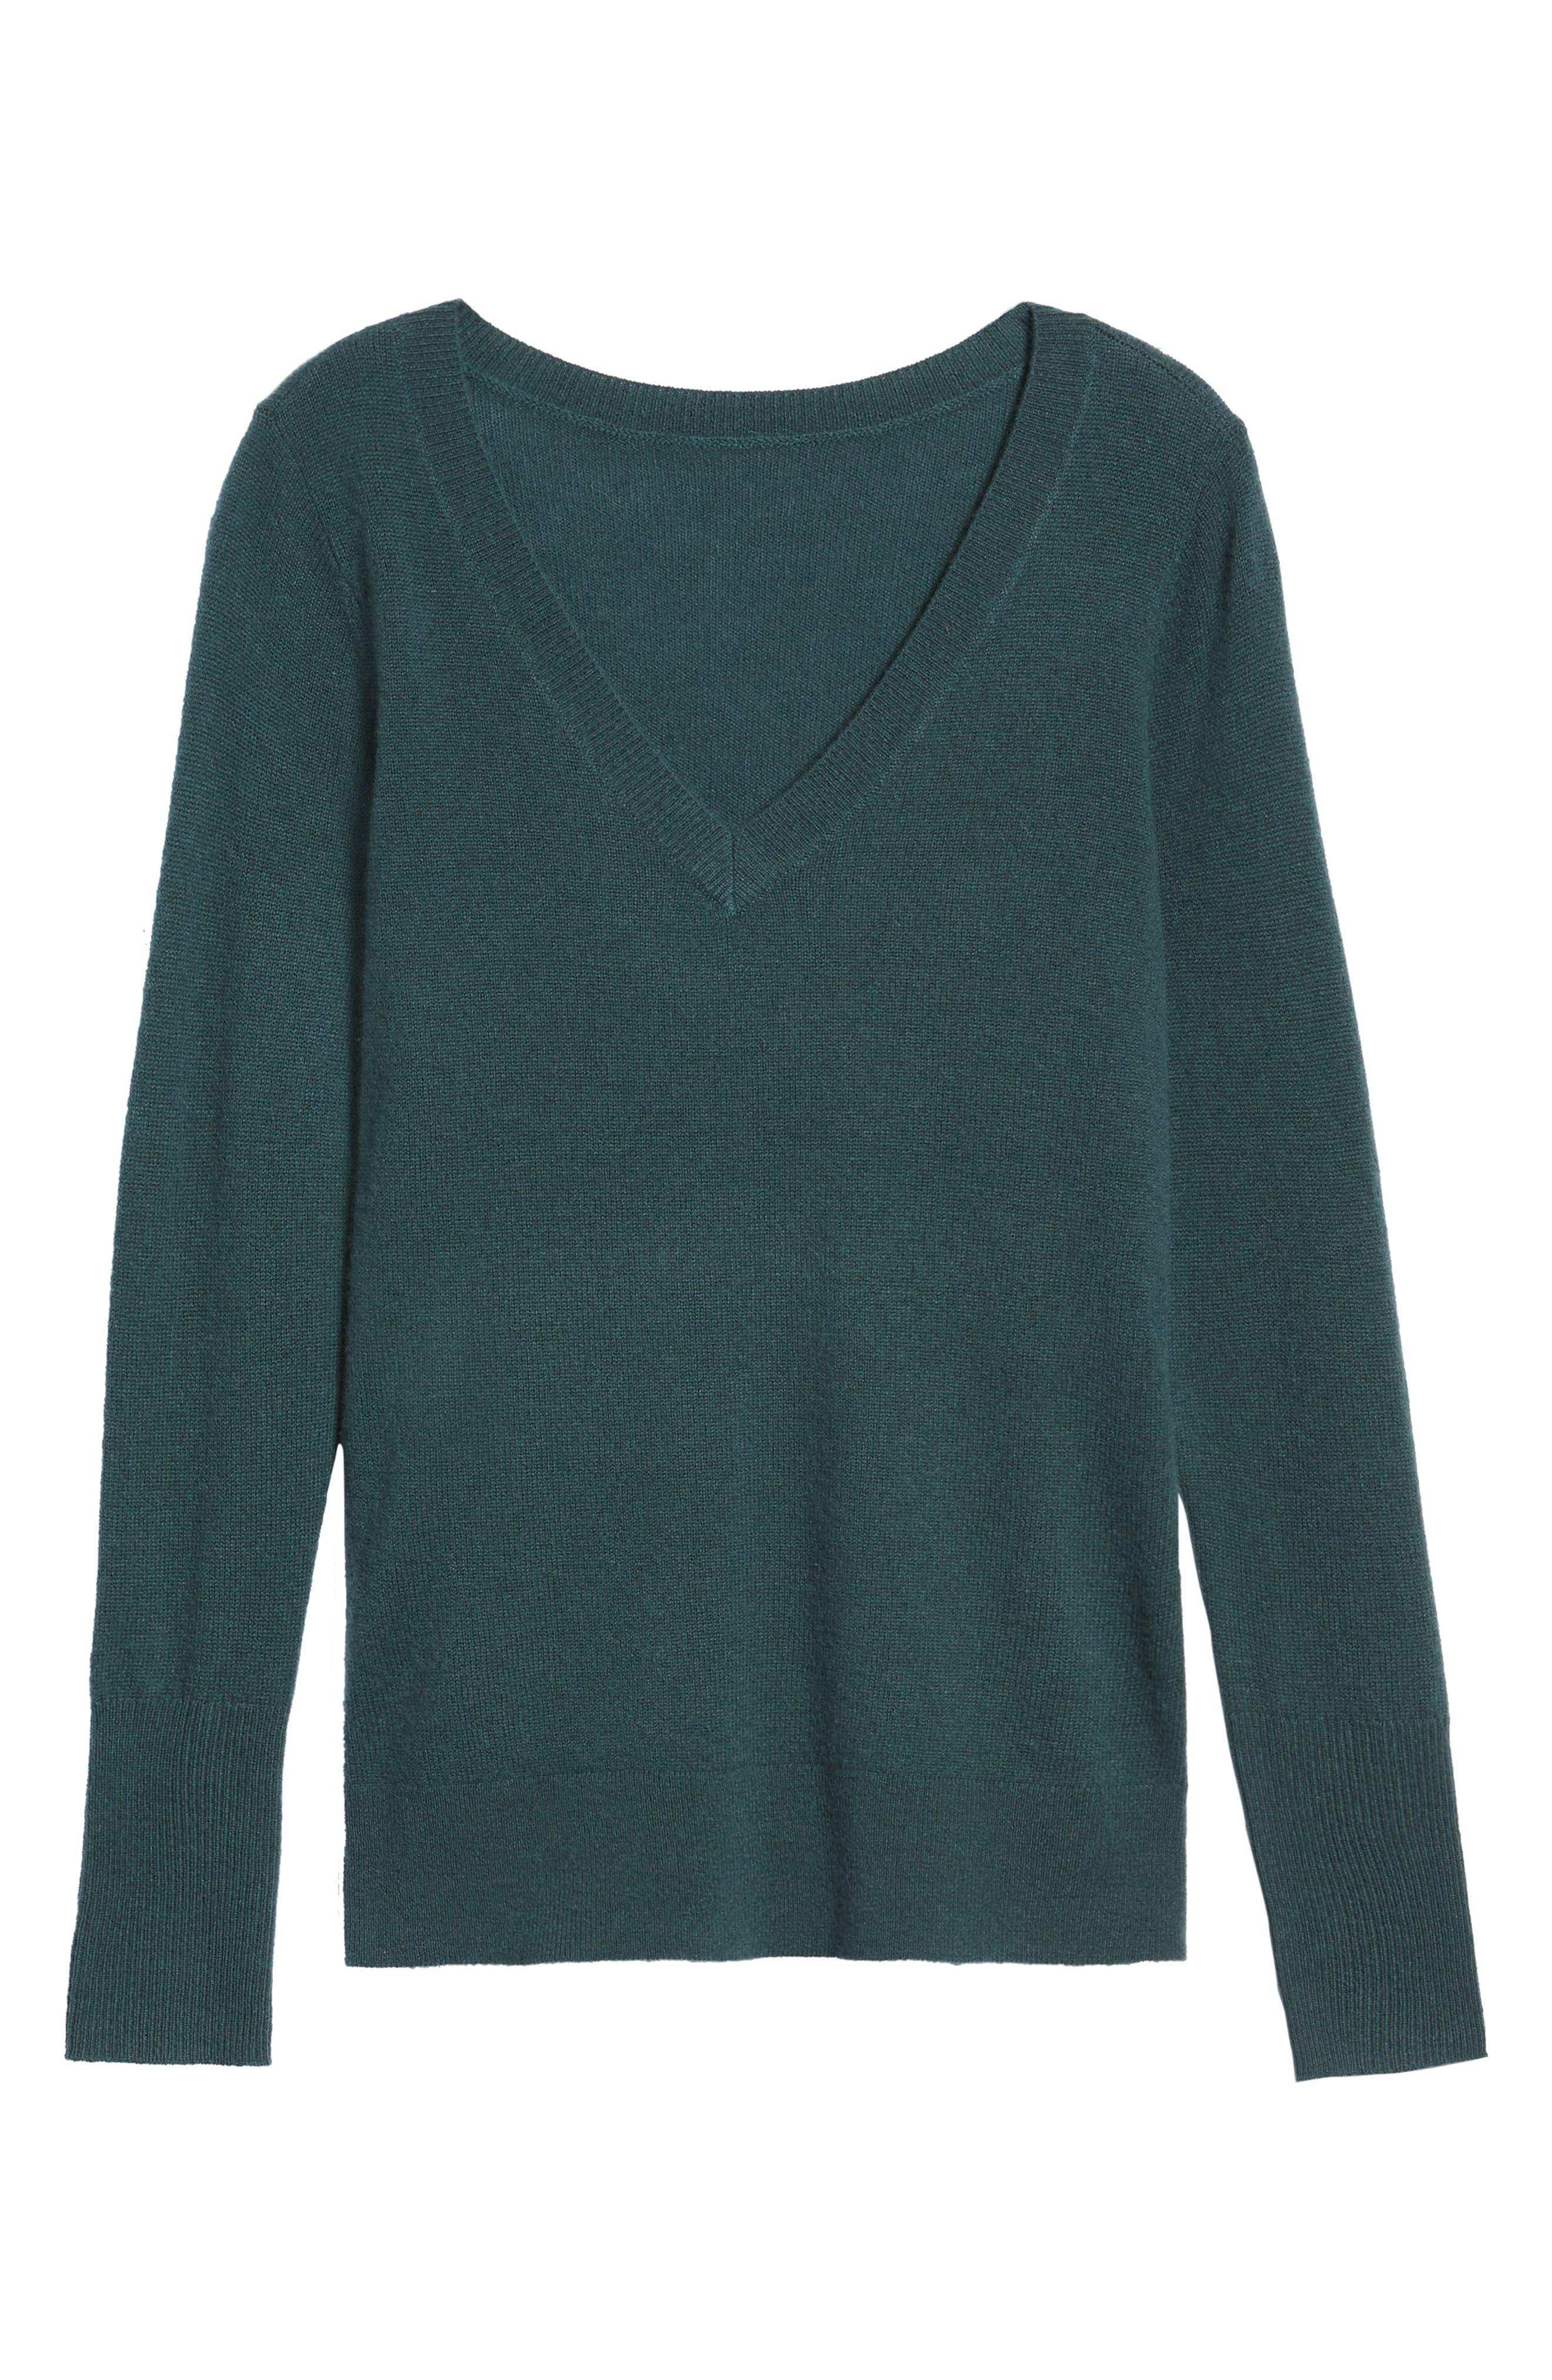 ,                             V-Neck Cashmere Sweater,                             Alternate thumbnail 35, color,                             300